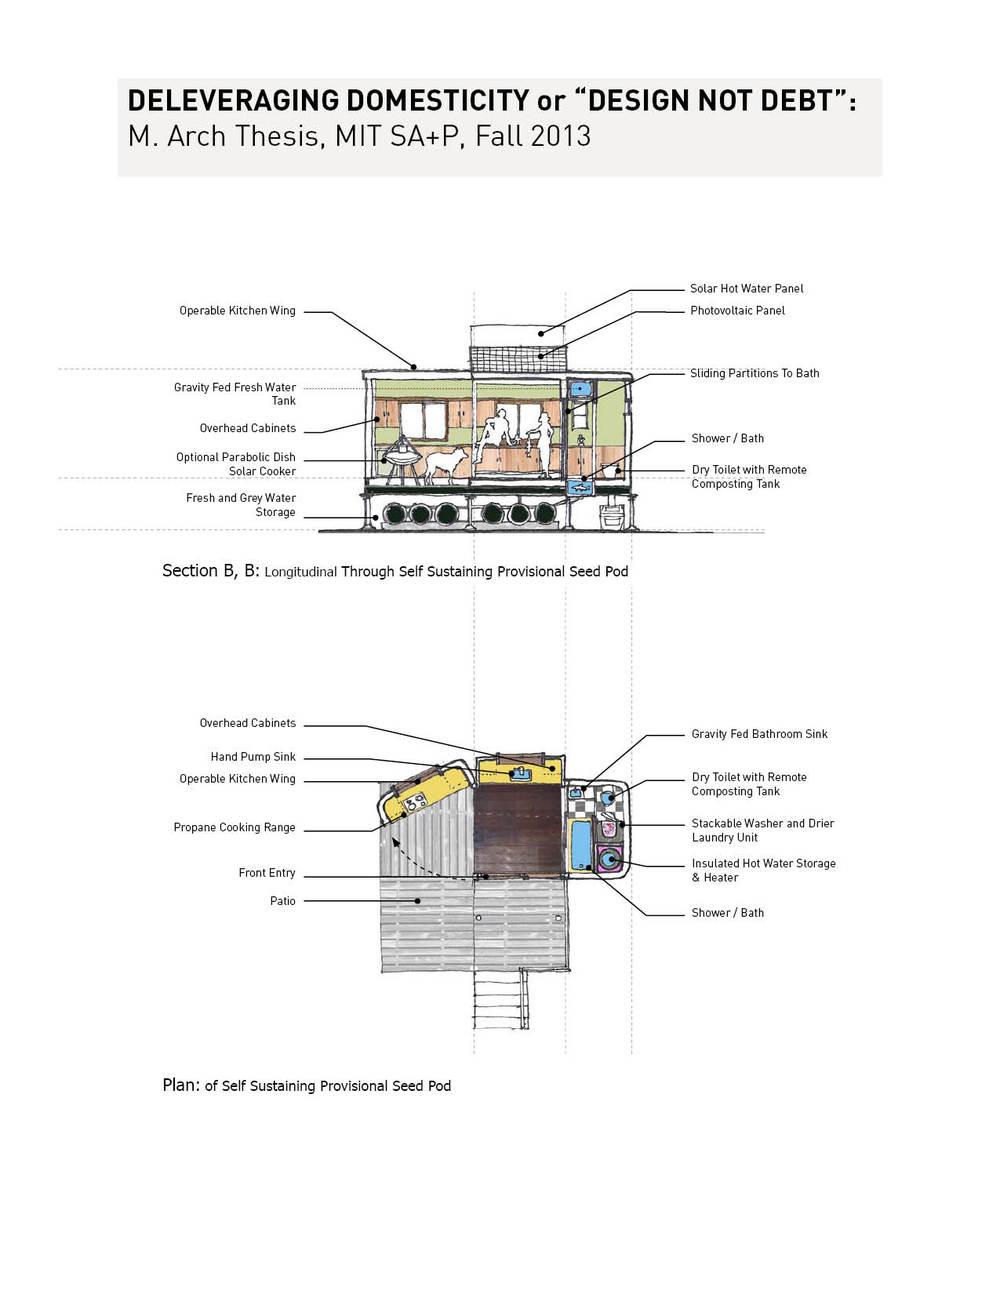 MIT_thesis6.jpg